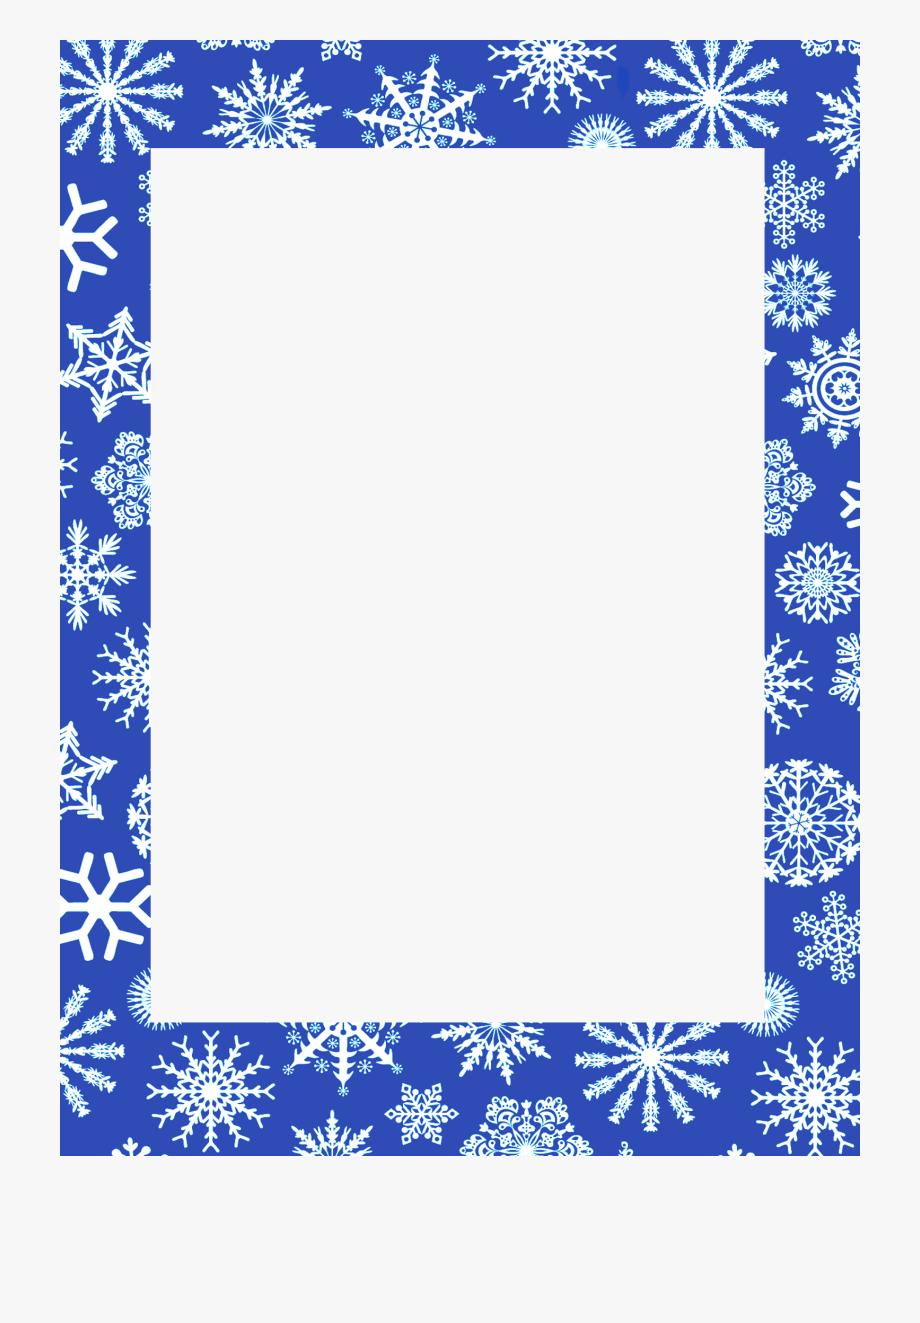 Winter Frame Png.